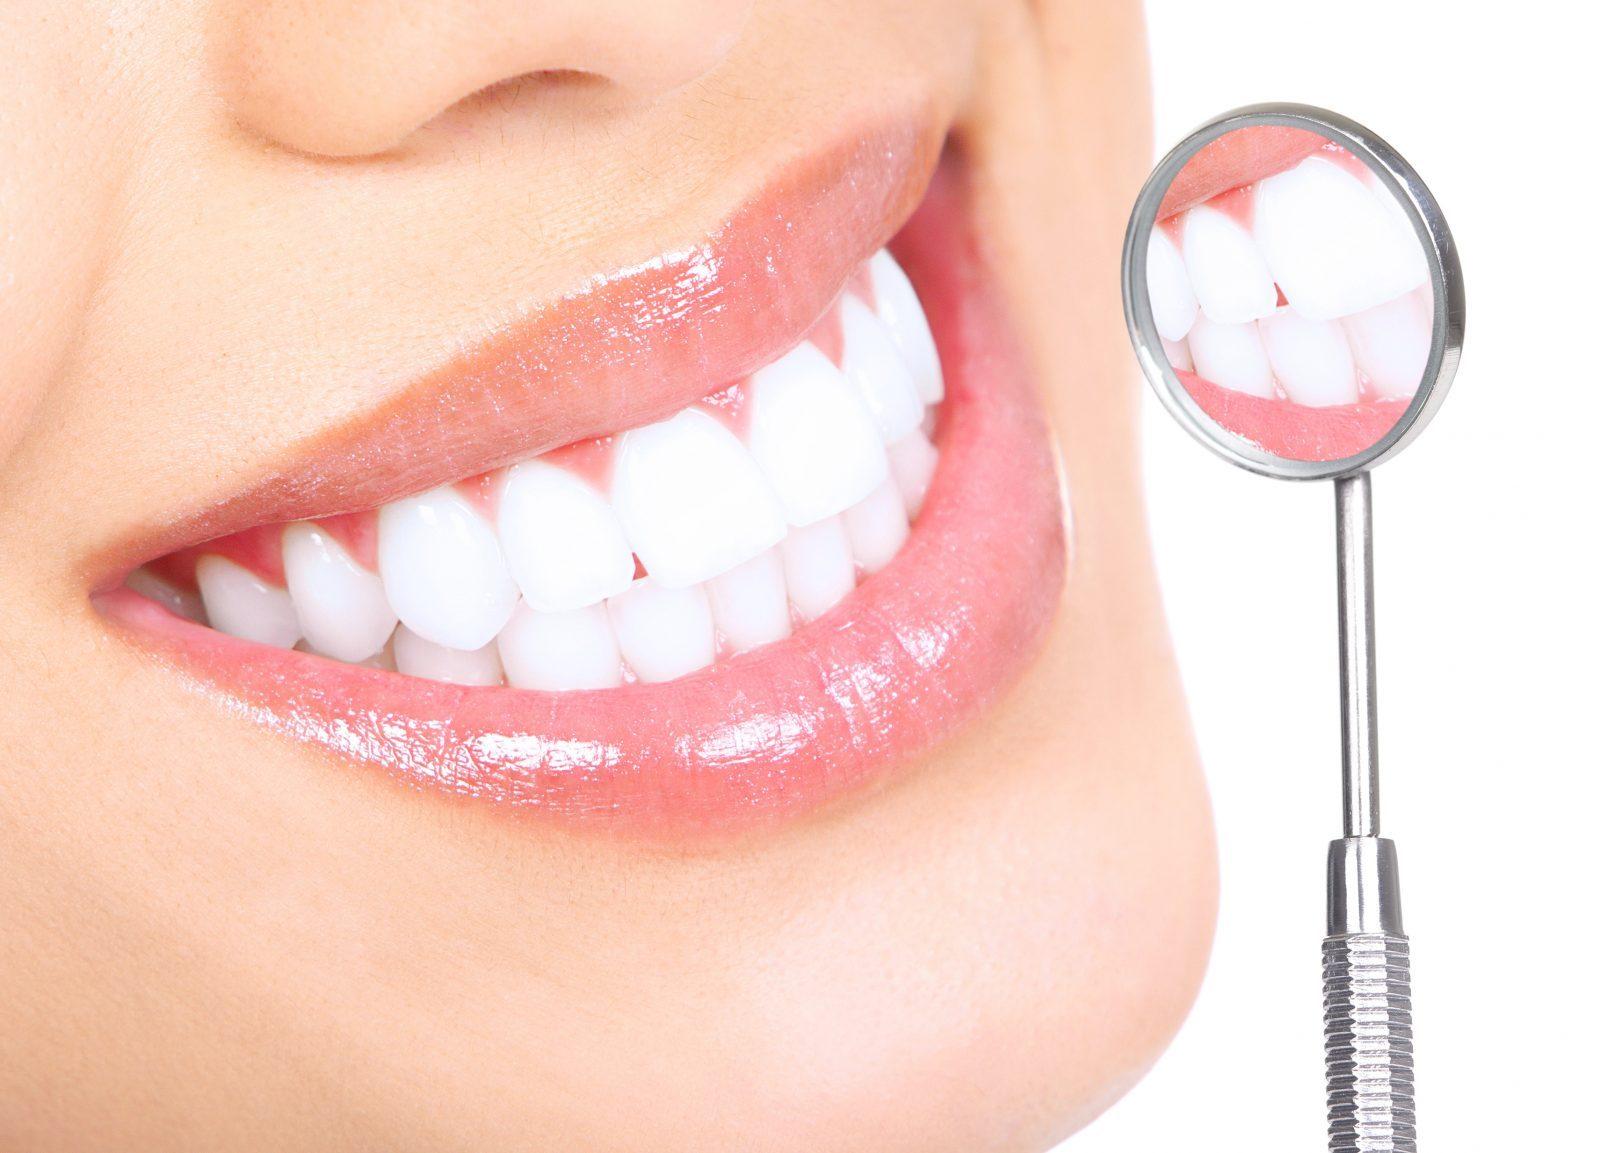 clareamento dental a laser e profissional